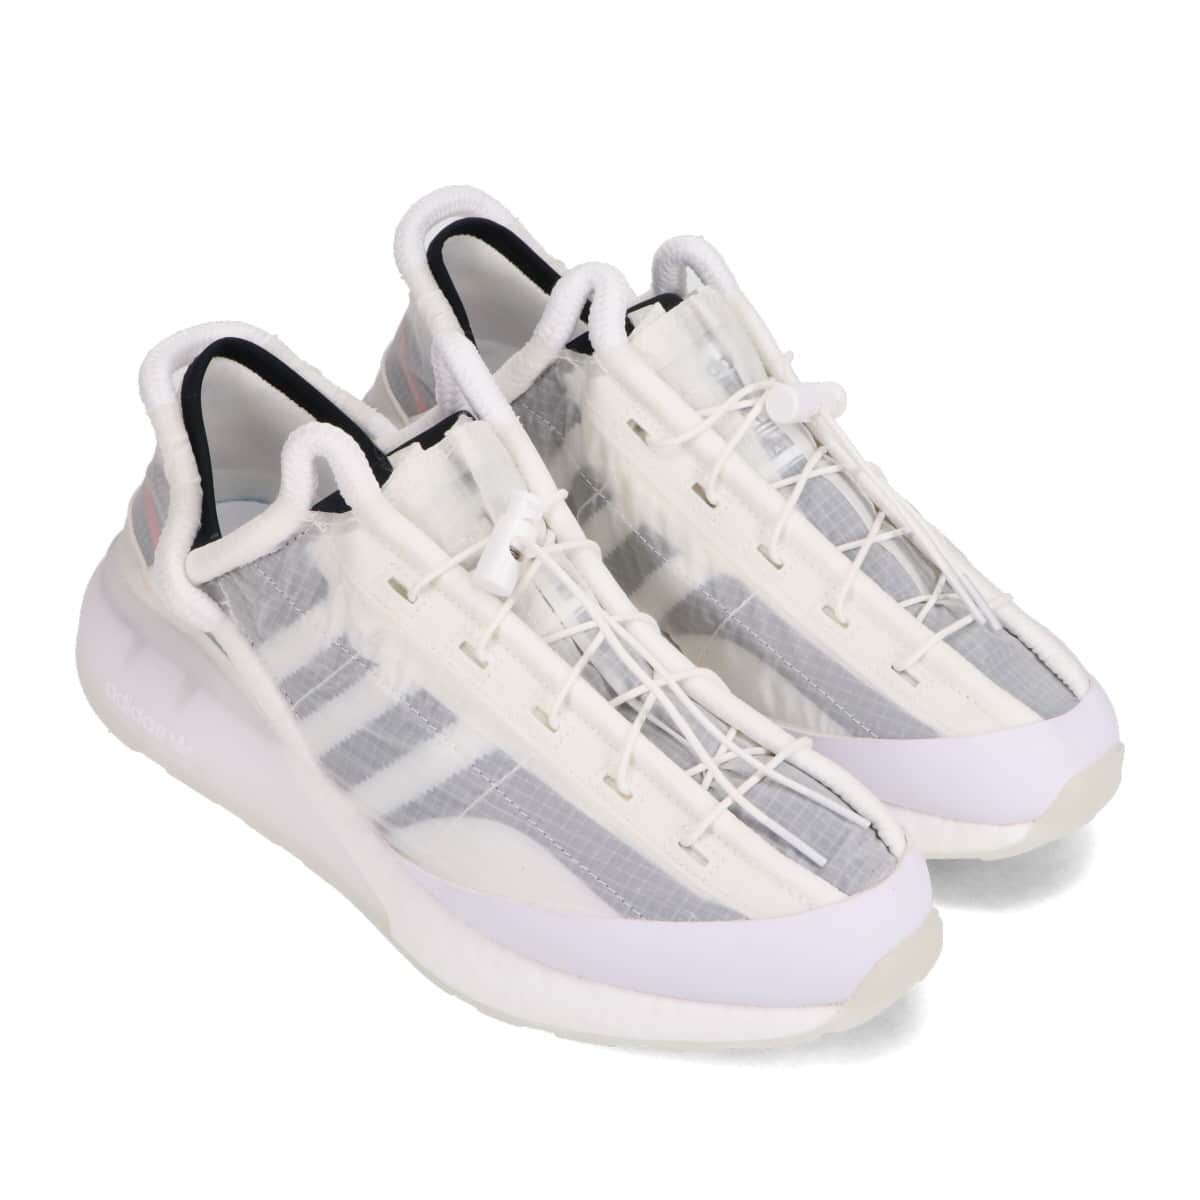 adidas CG ZX 2K PHORMAR CORE WHITE/CORE WHITE/CORE BLACK 20FW-S_photo_large